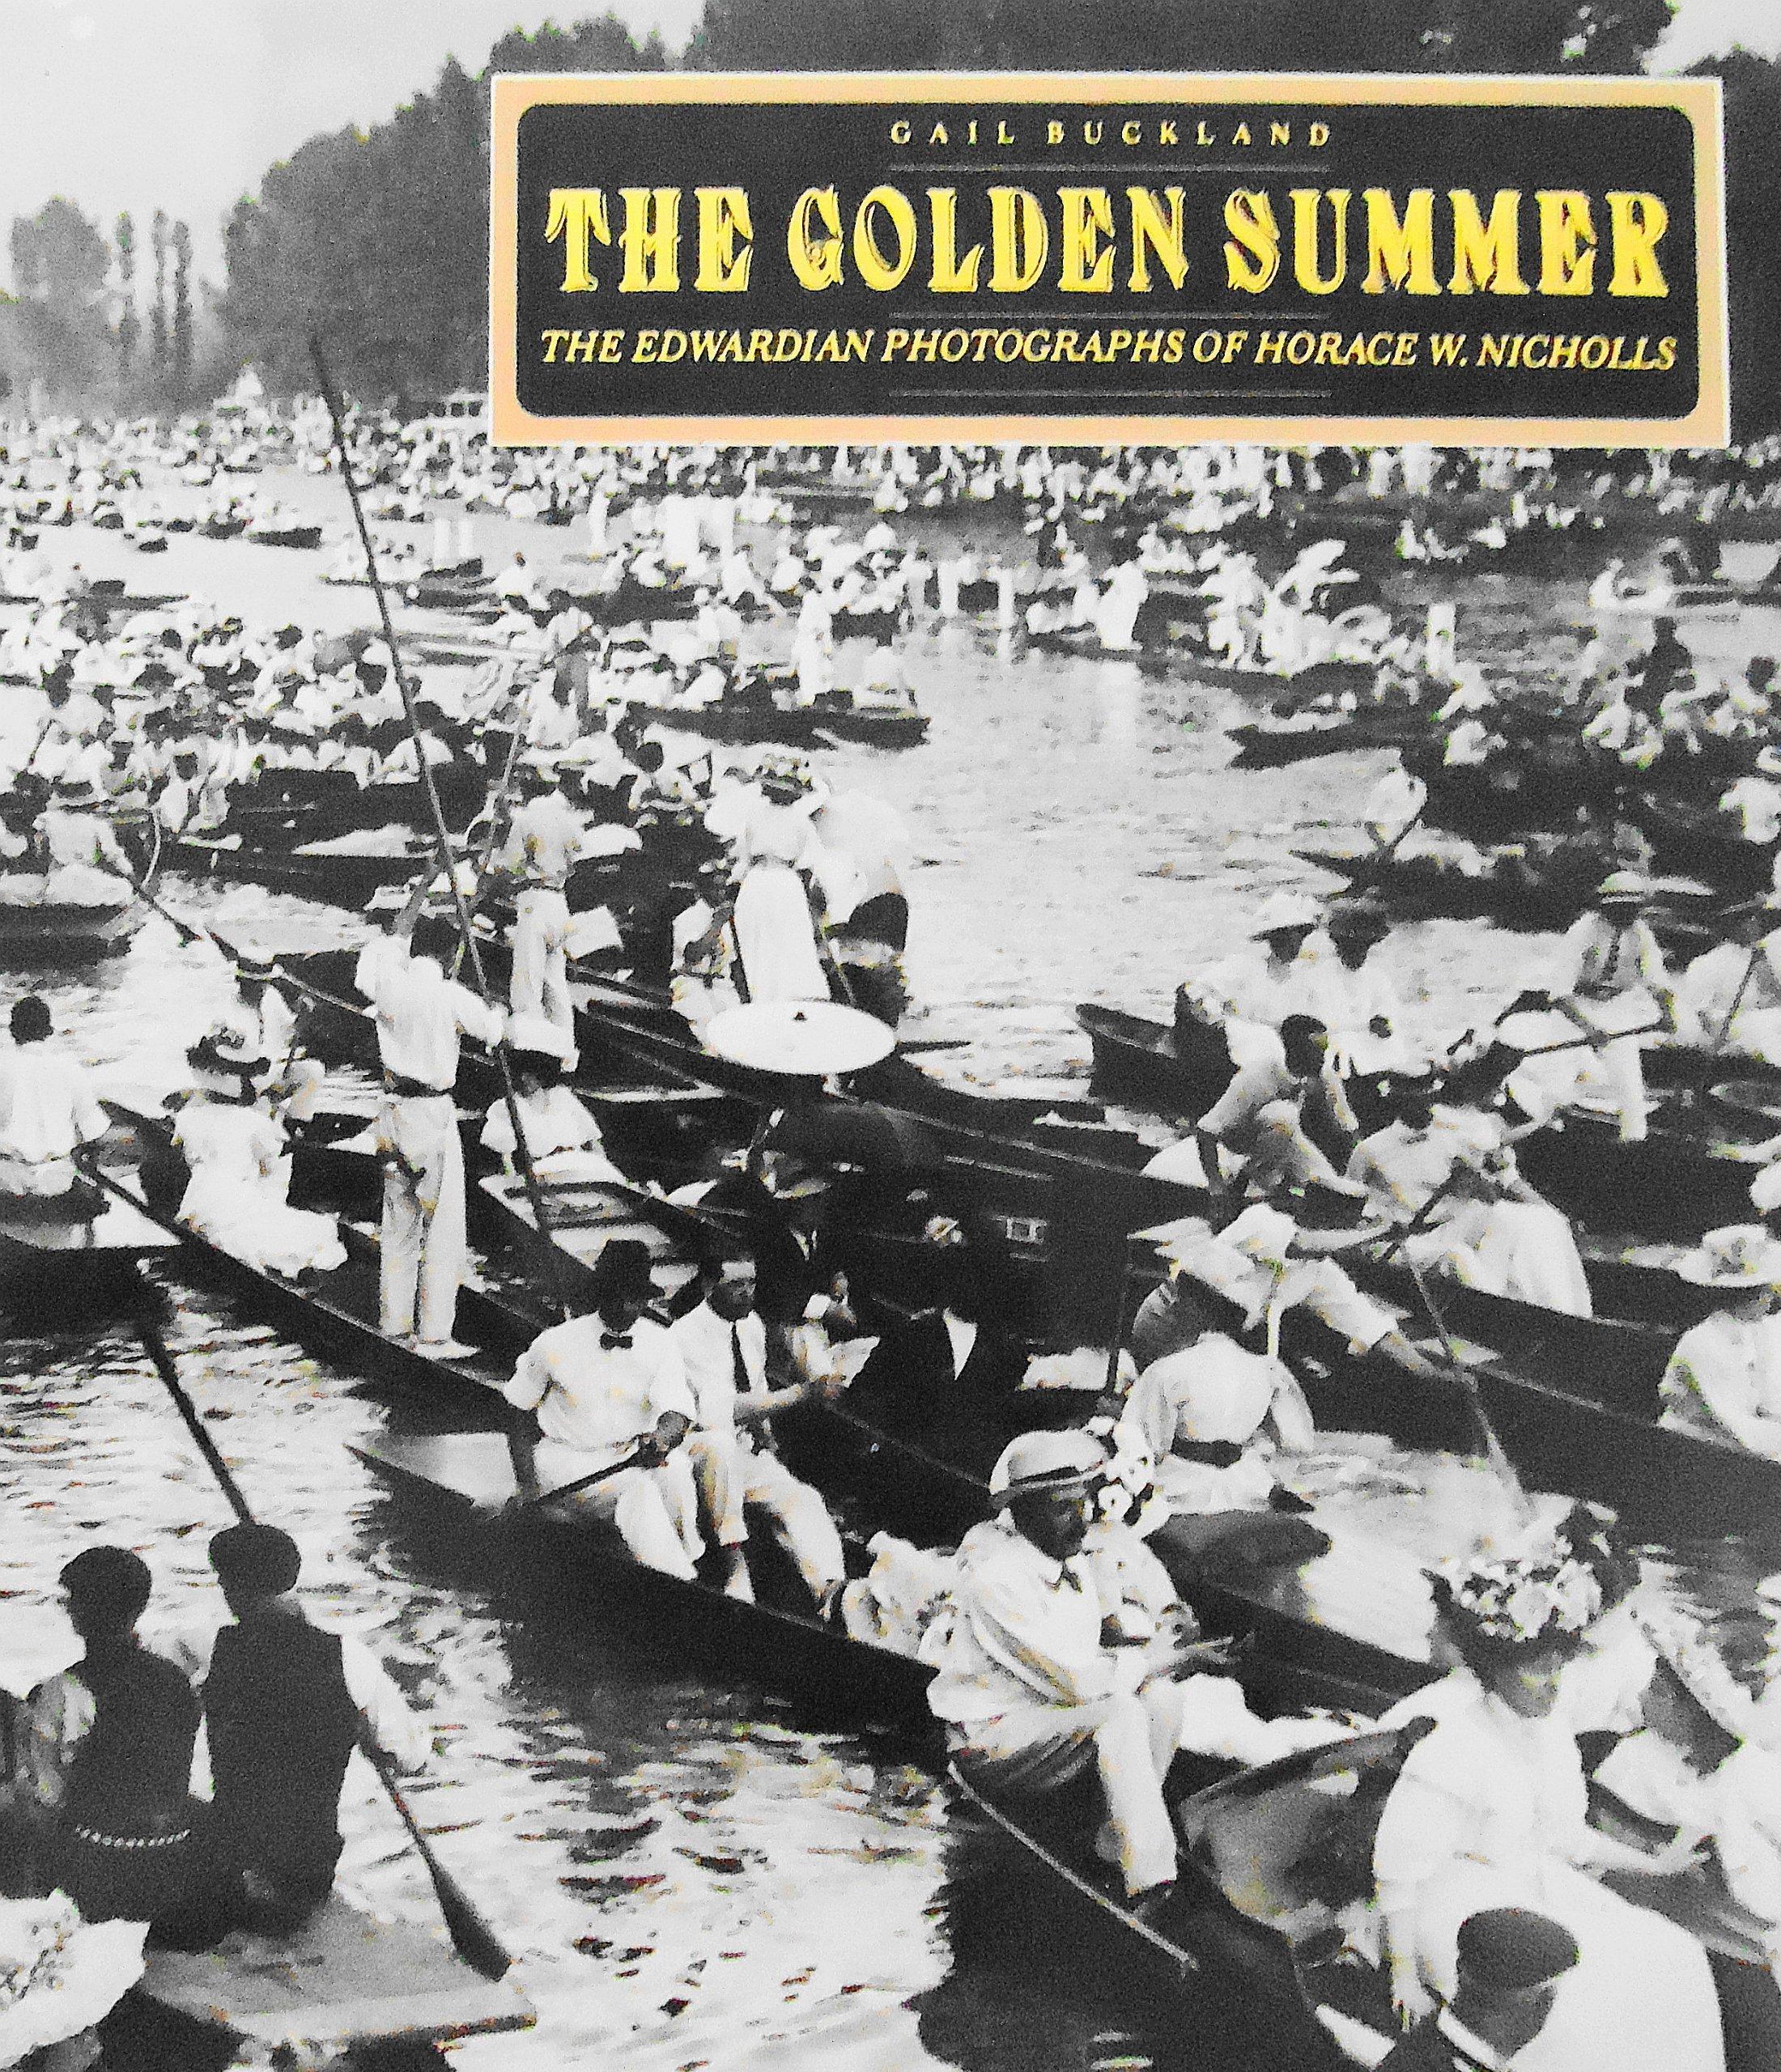 The Golden Summer: The Edwardian Photographs of Horace W. Nicholls